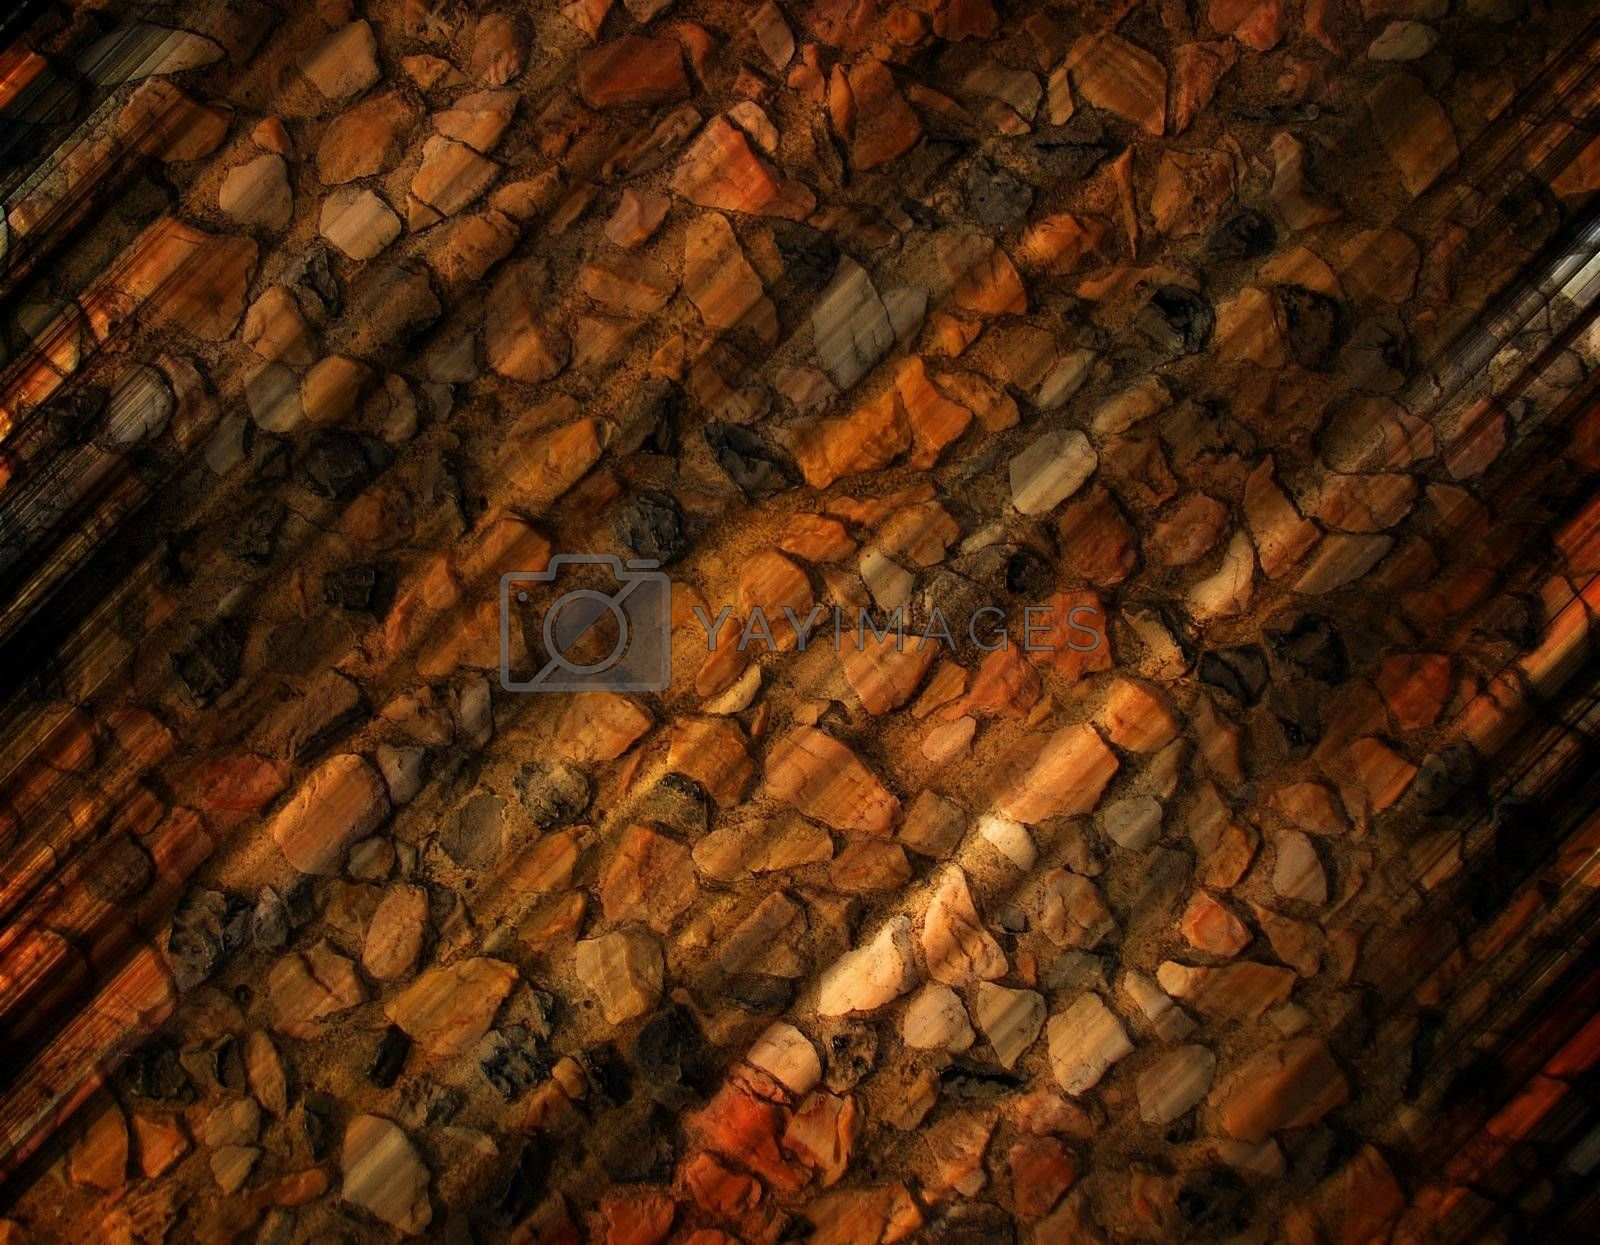 Blurred stones close up